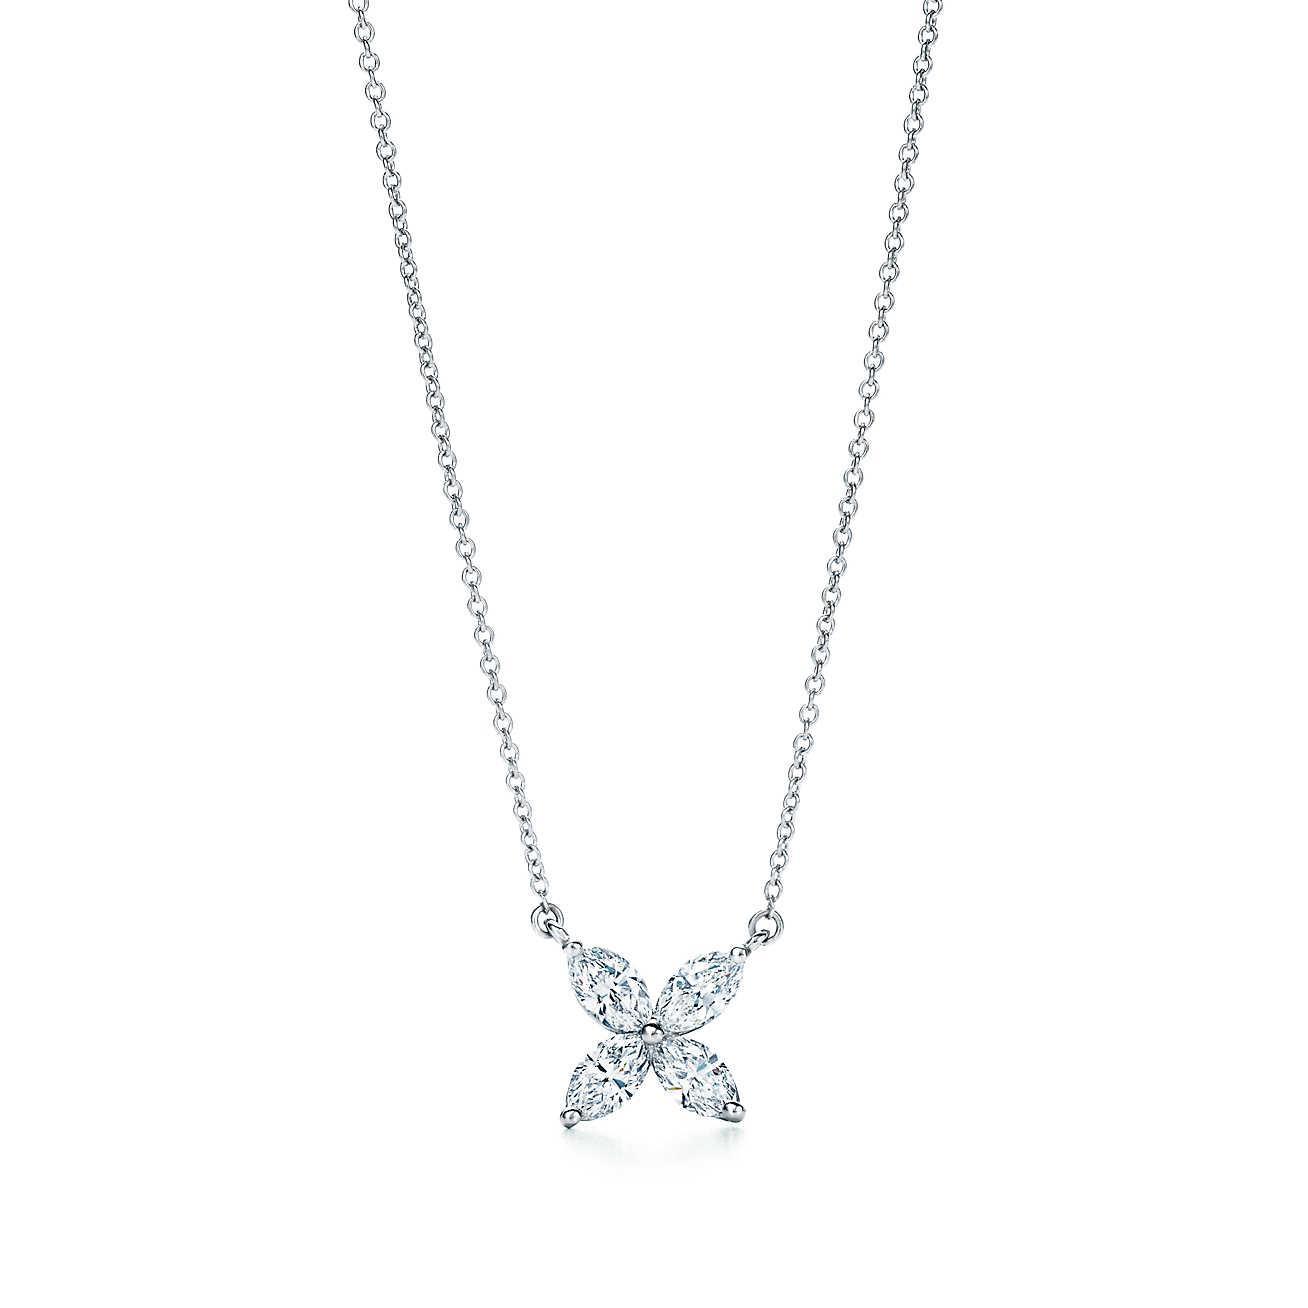 Tiffany Victoria® pendant in platinum with diamonds, large